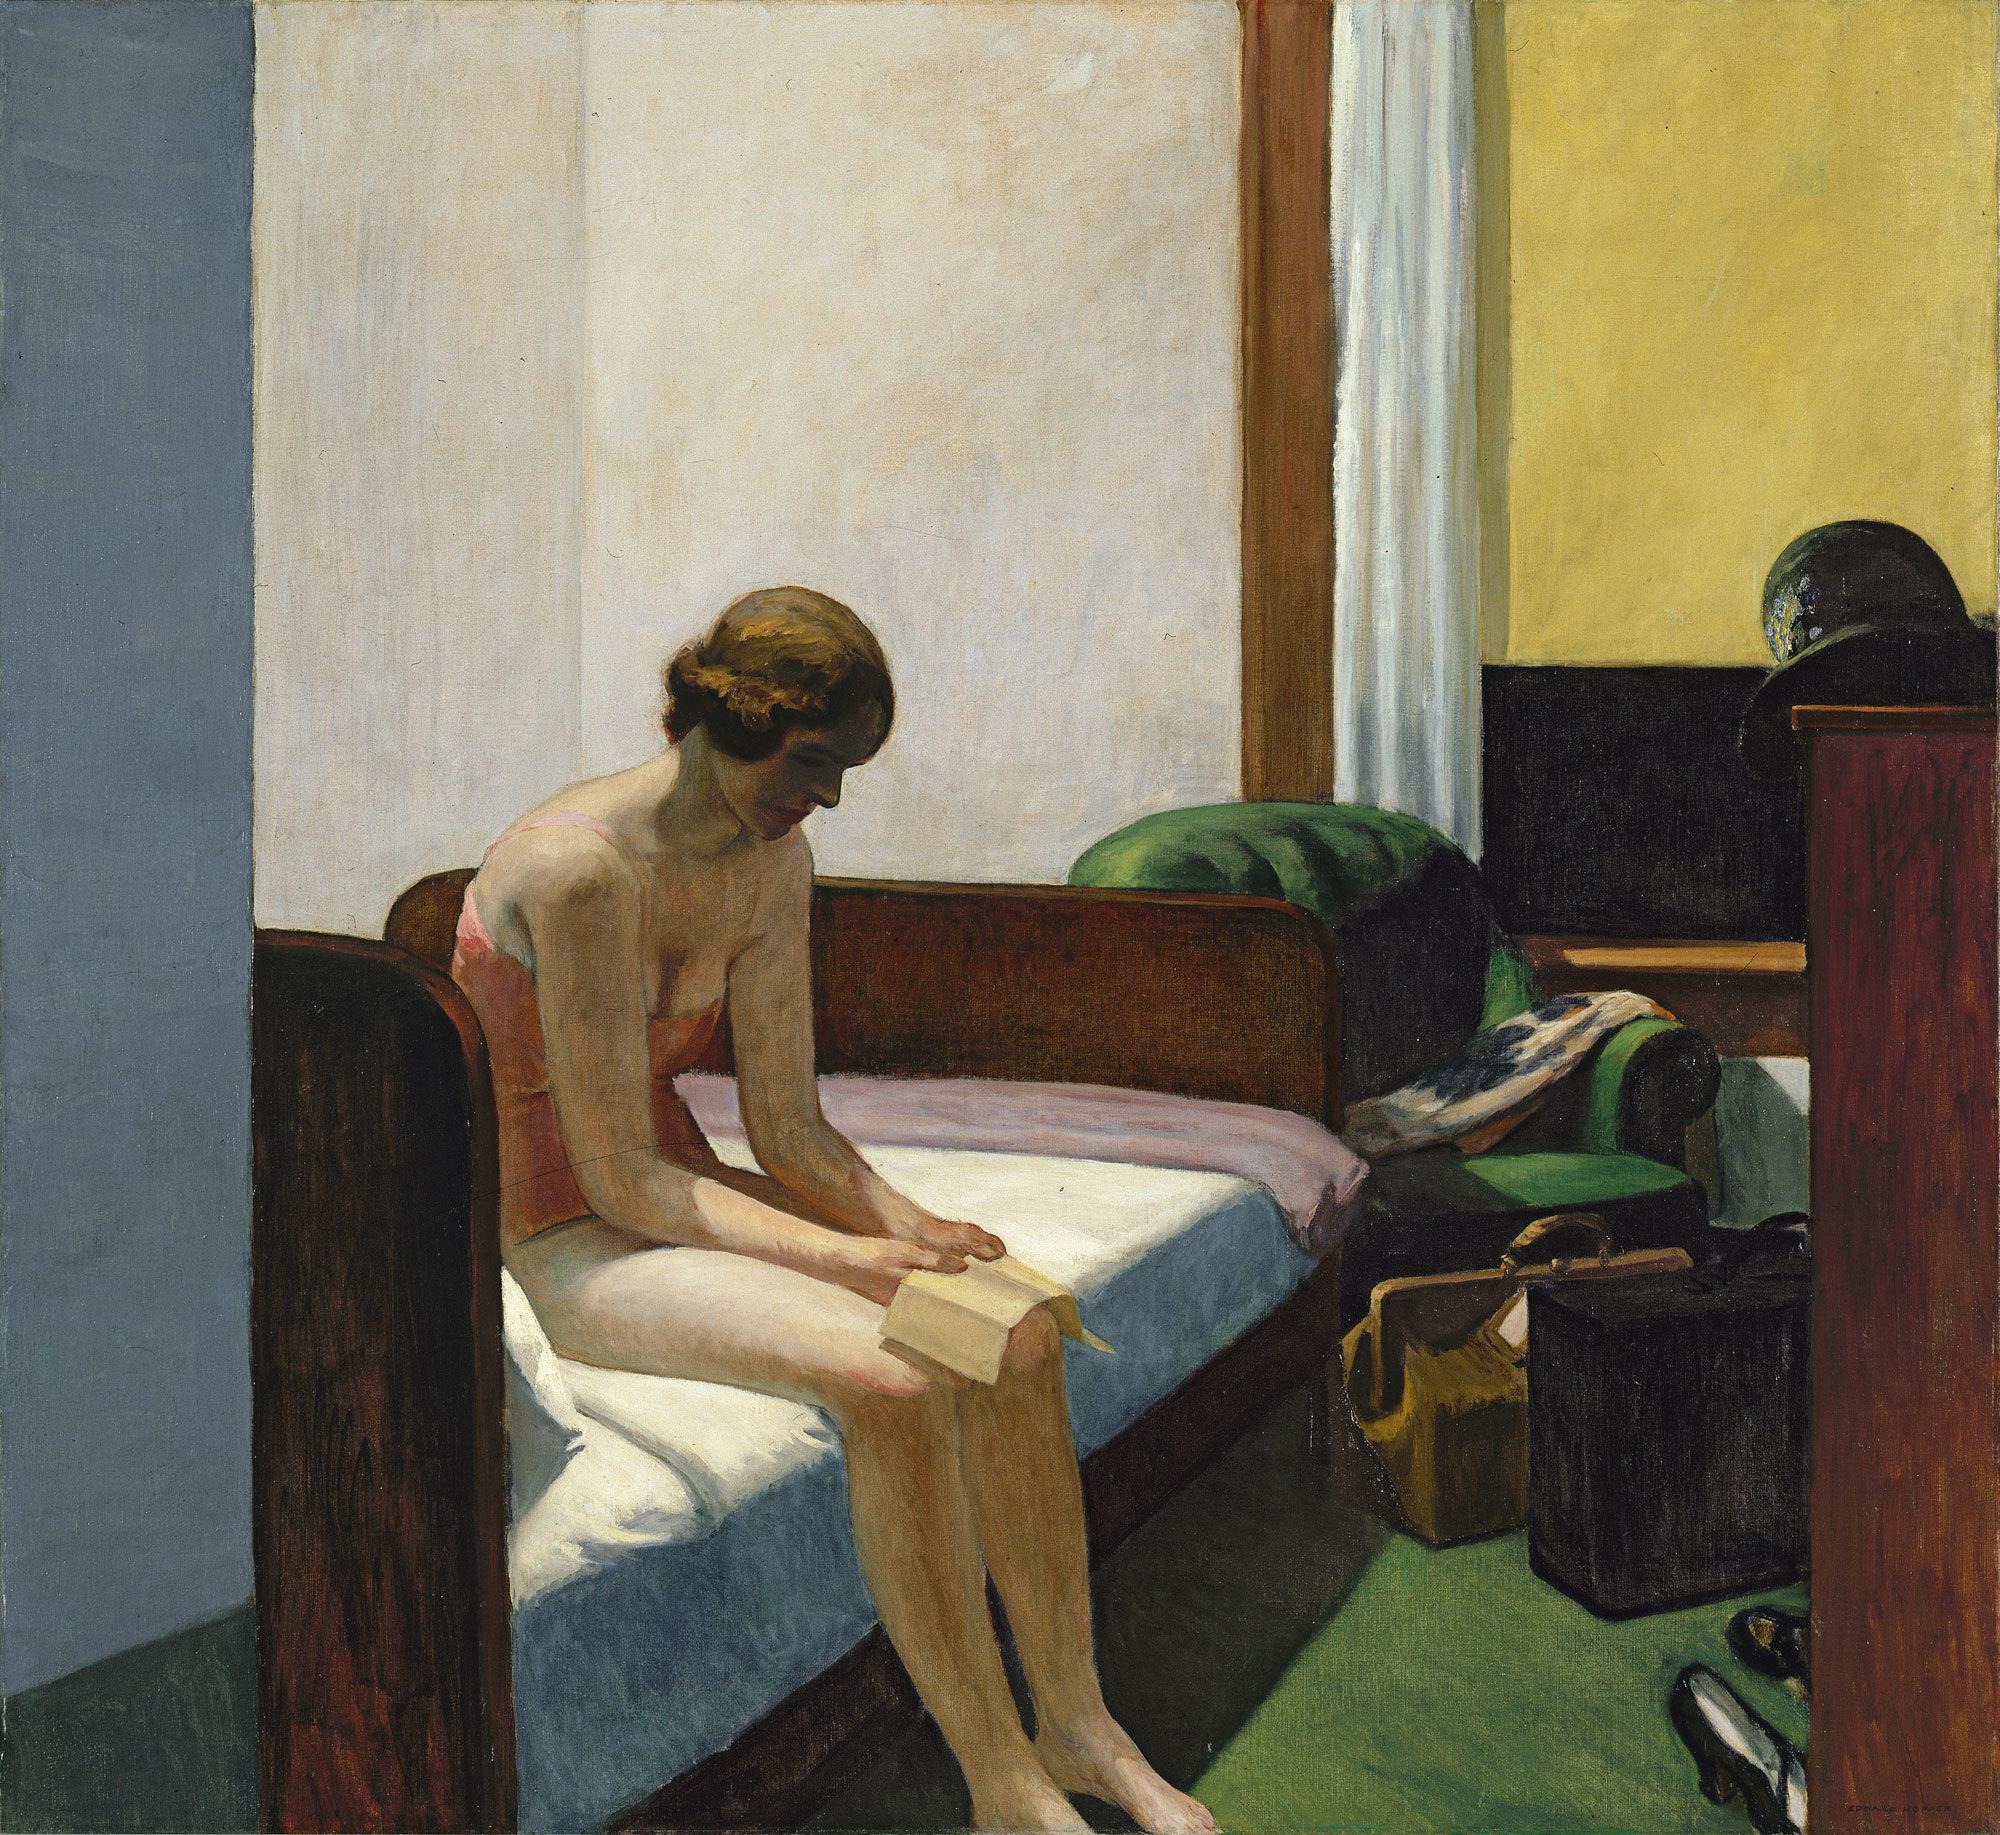 Edward Hopper, Hotel Room